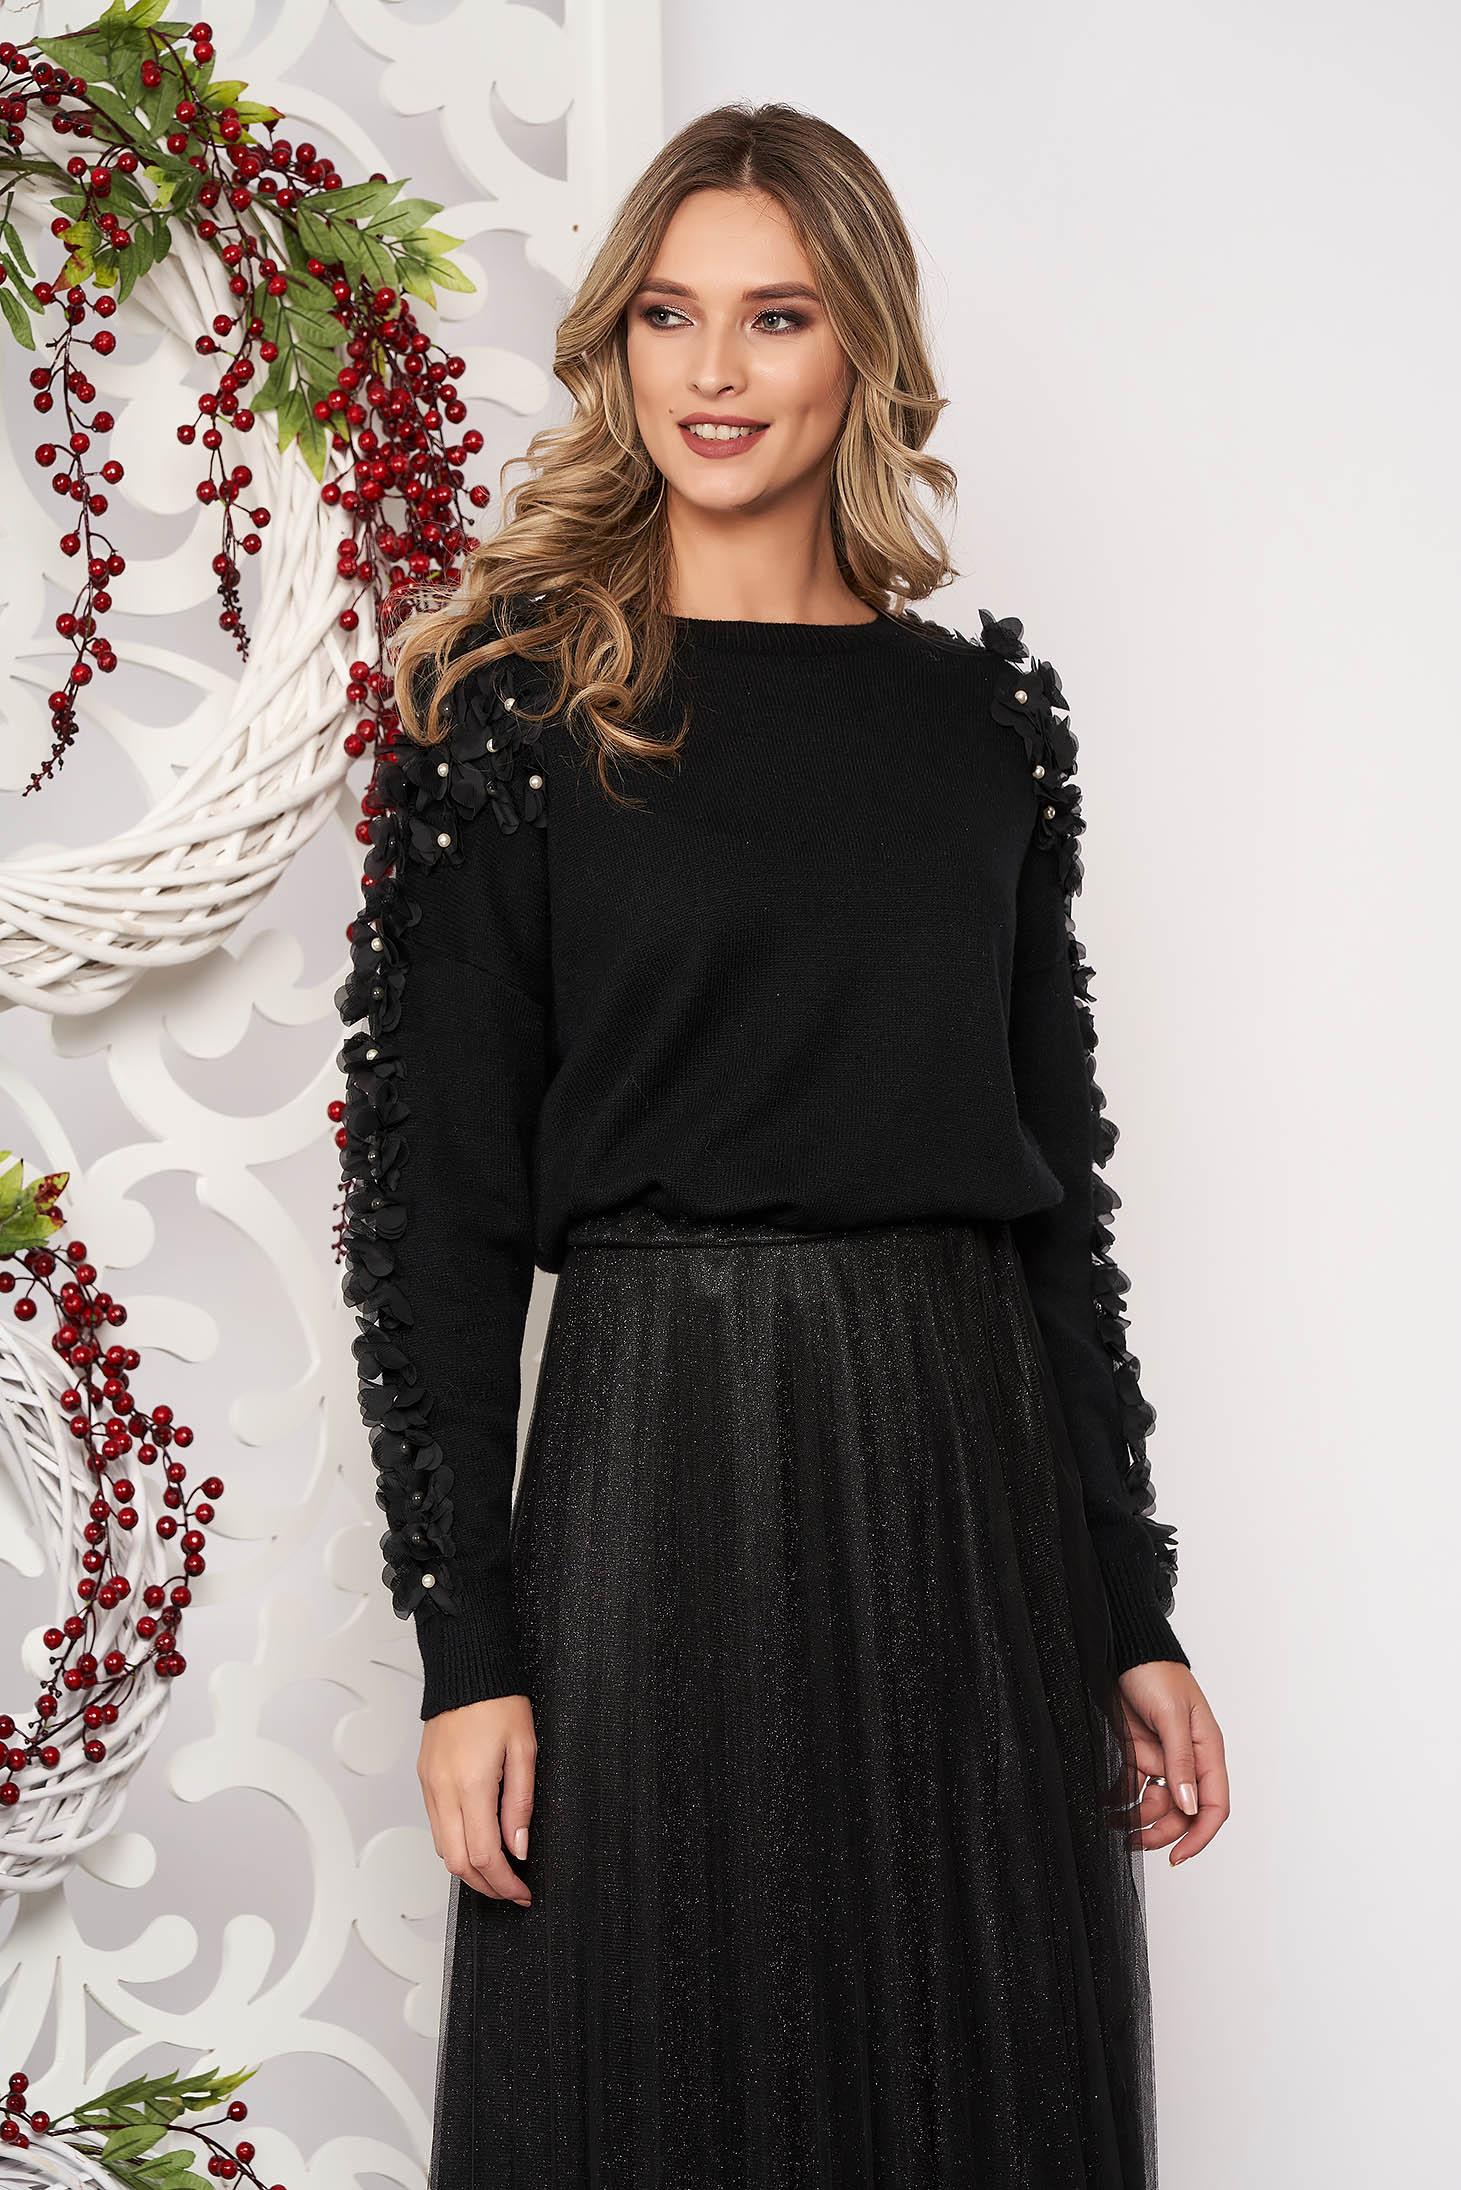 Pulover SunShine negru scurt elegant din lana cu croi larg cu aplicatii cu perle si tul cu maneca lunga